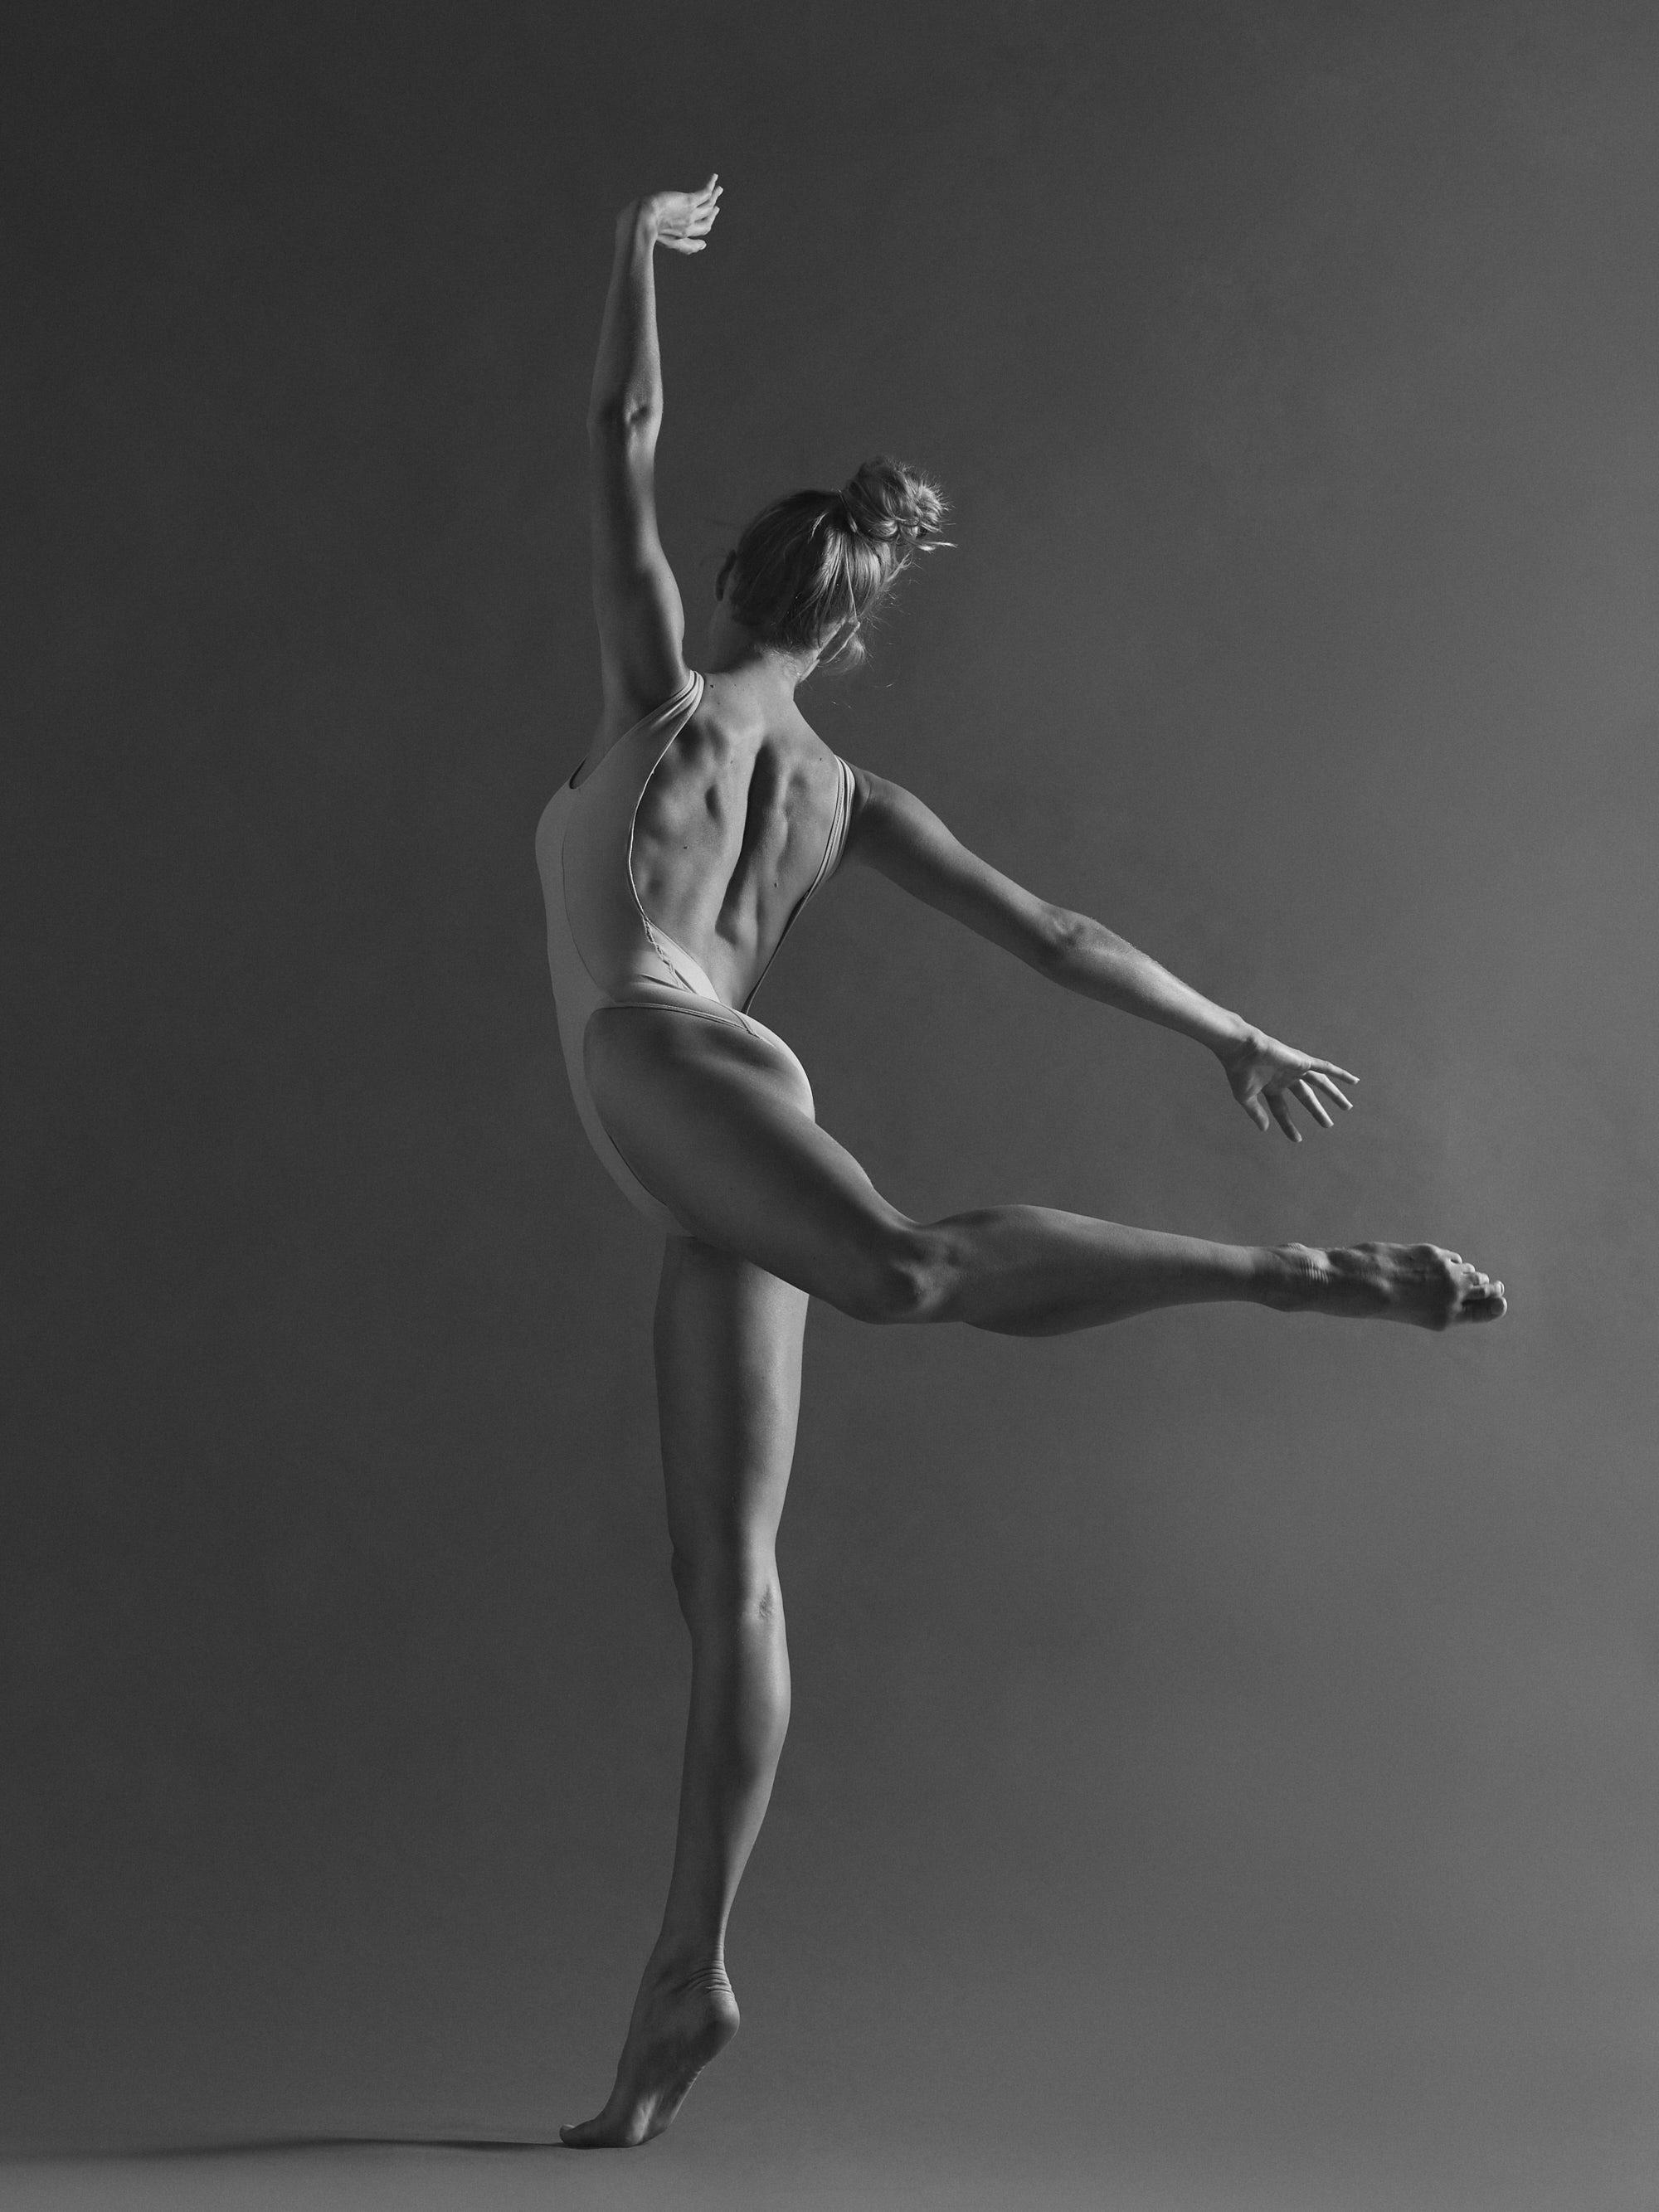 Maddie Peat ballerina.jpg